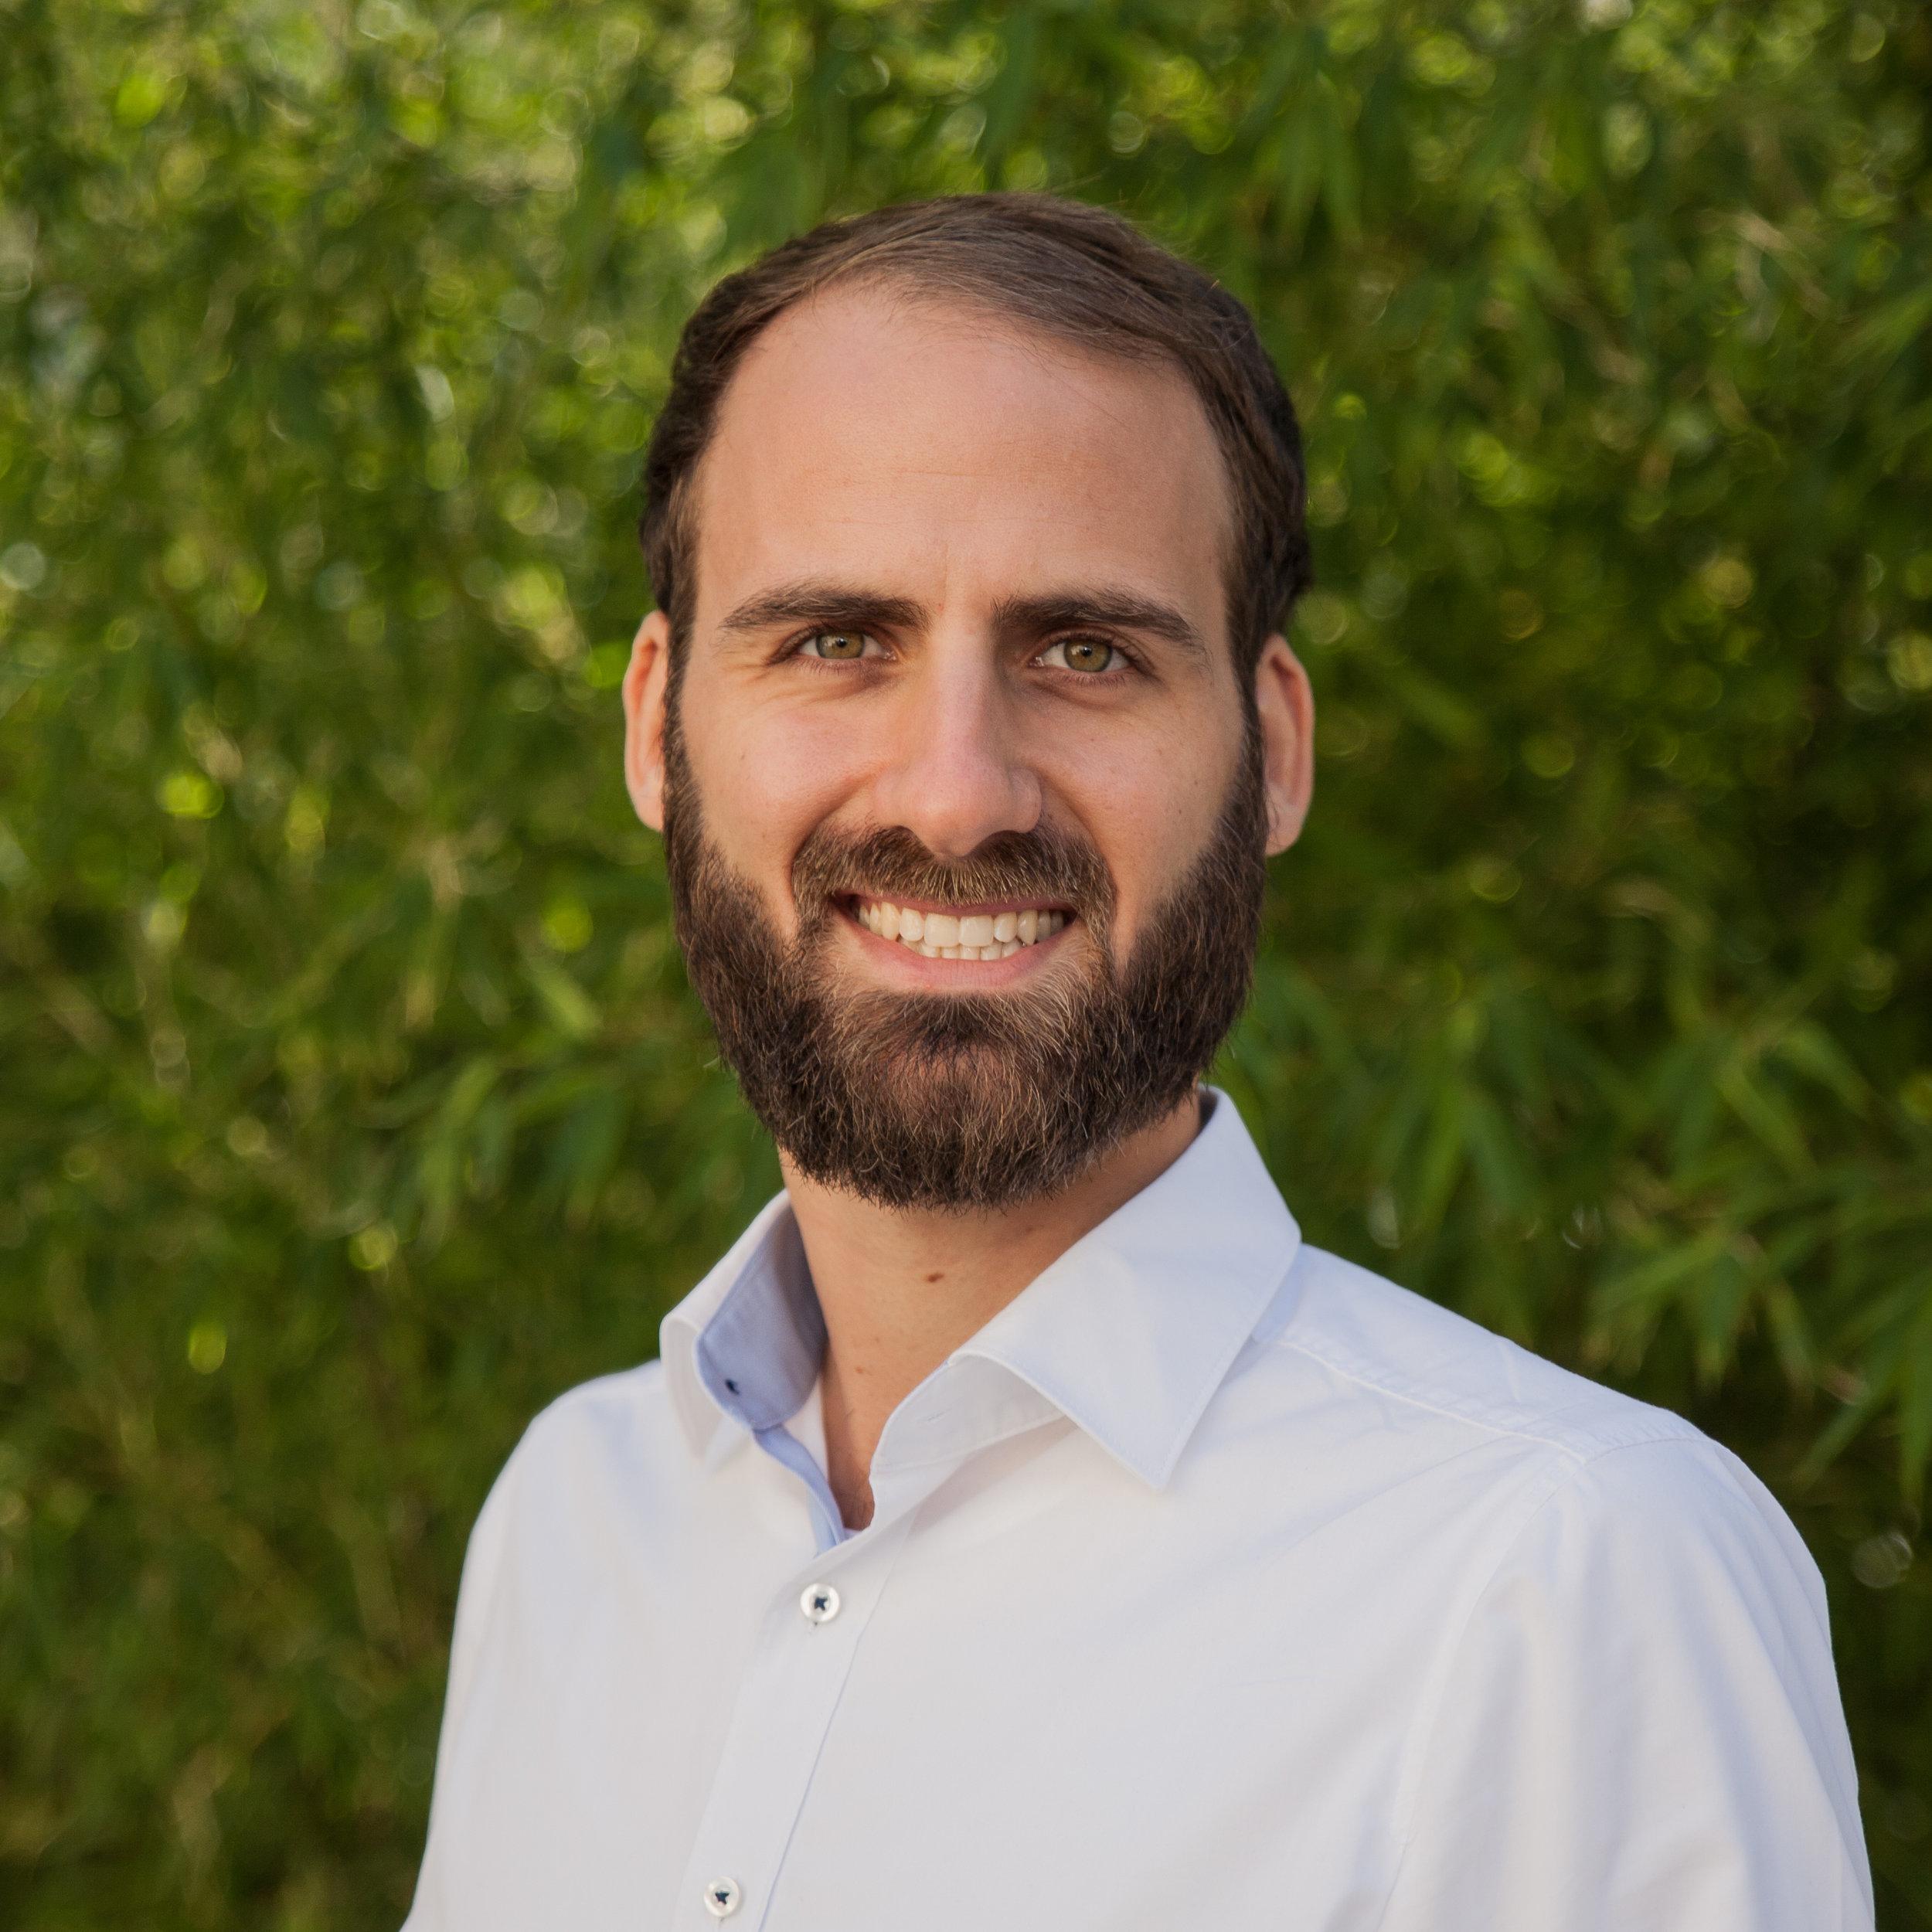 Jan Hammer   Ph.D.Student   janh@ece.ubc.ca    LinkedIn